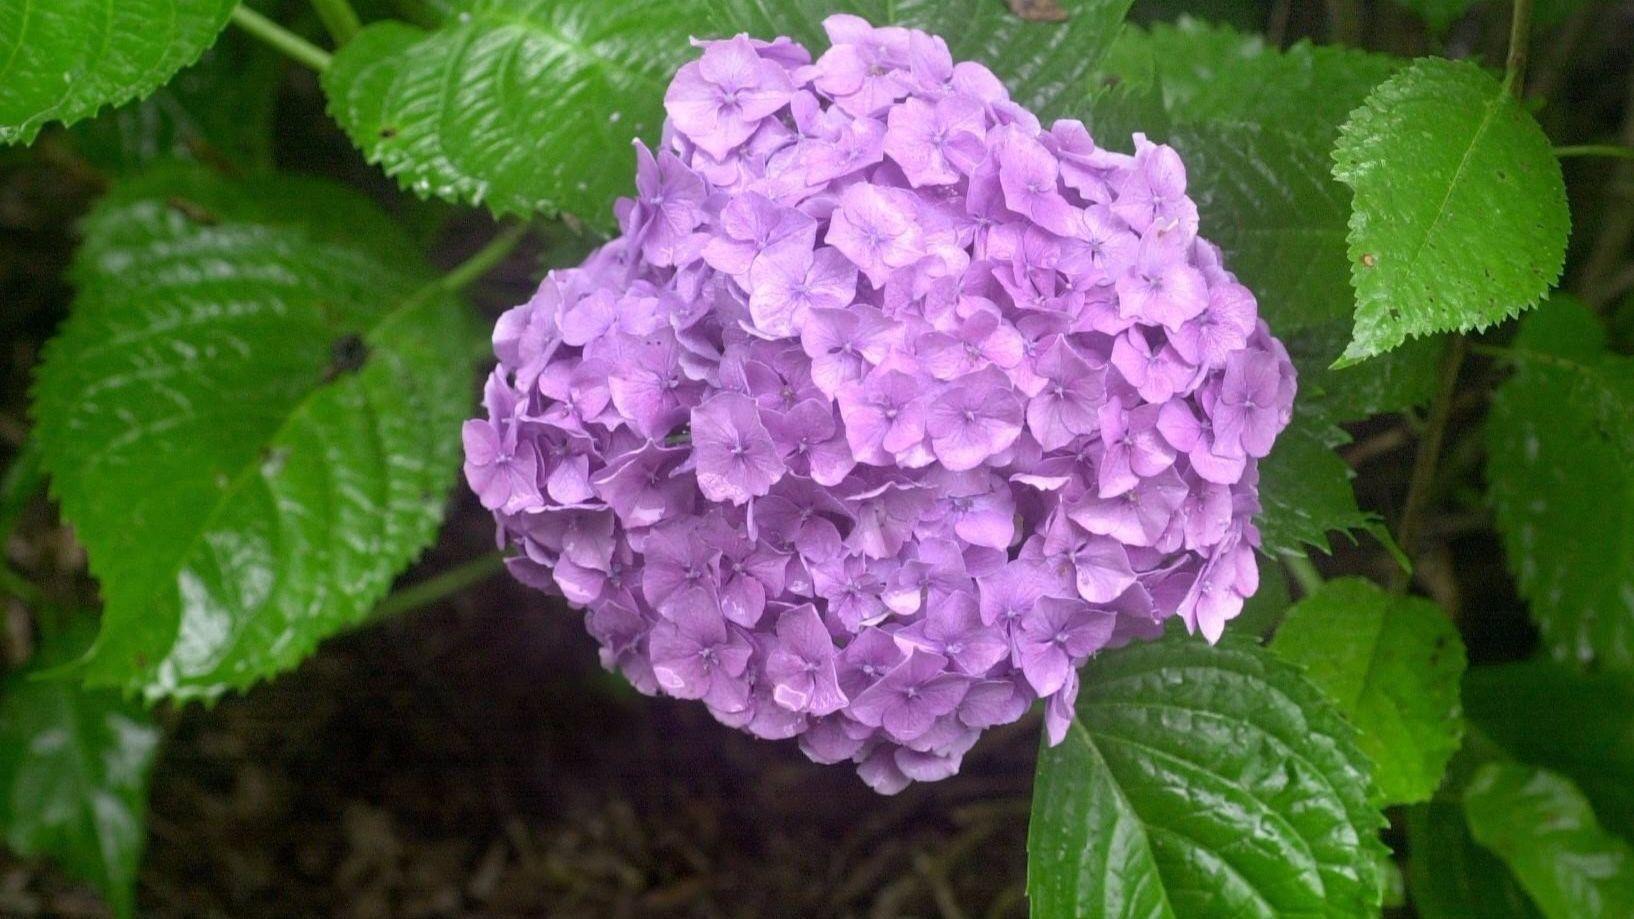 Gardening Should You Prune Hydrangea Plants In The Fall